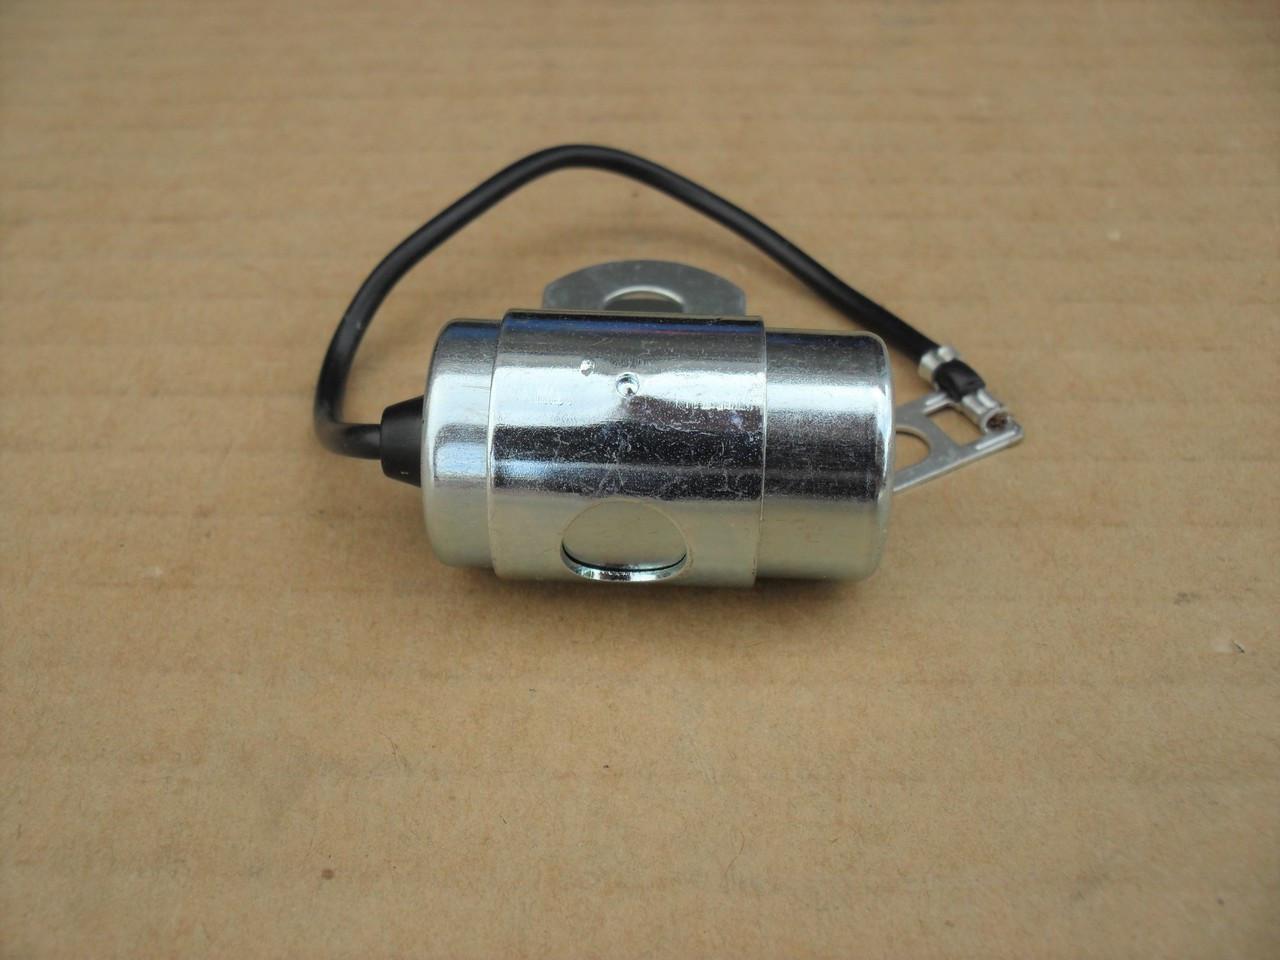 Condenser fits Kohler 4714701S 4715003S 235786 for K181 K-Series 8 HP Engine